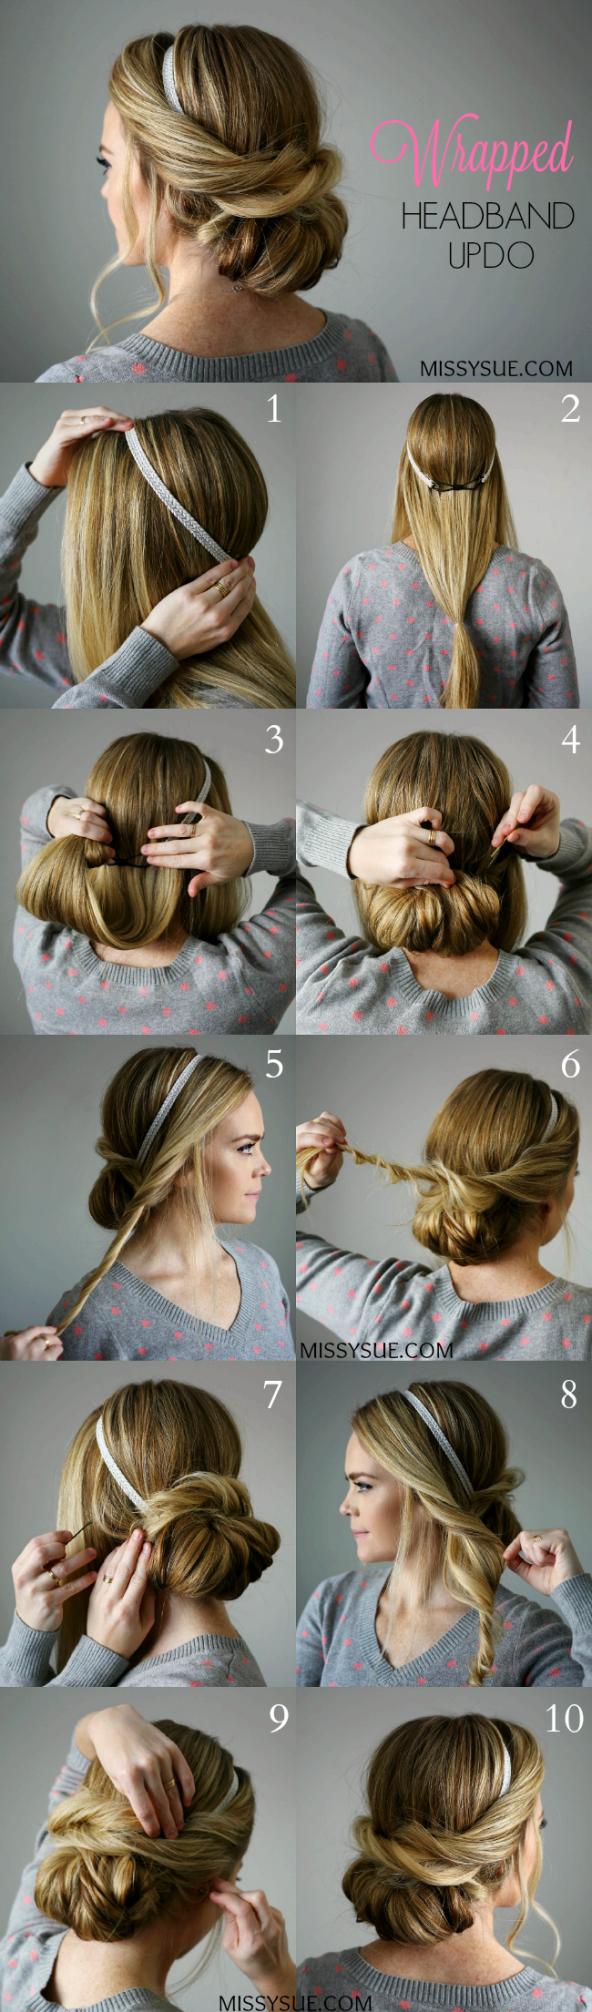 Wrapped headband updo hairnailsfashion pinterest hair hair